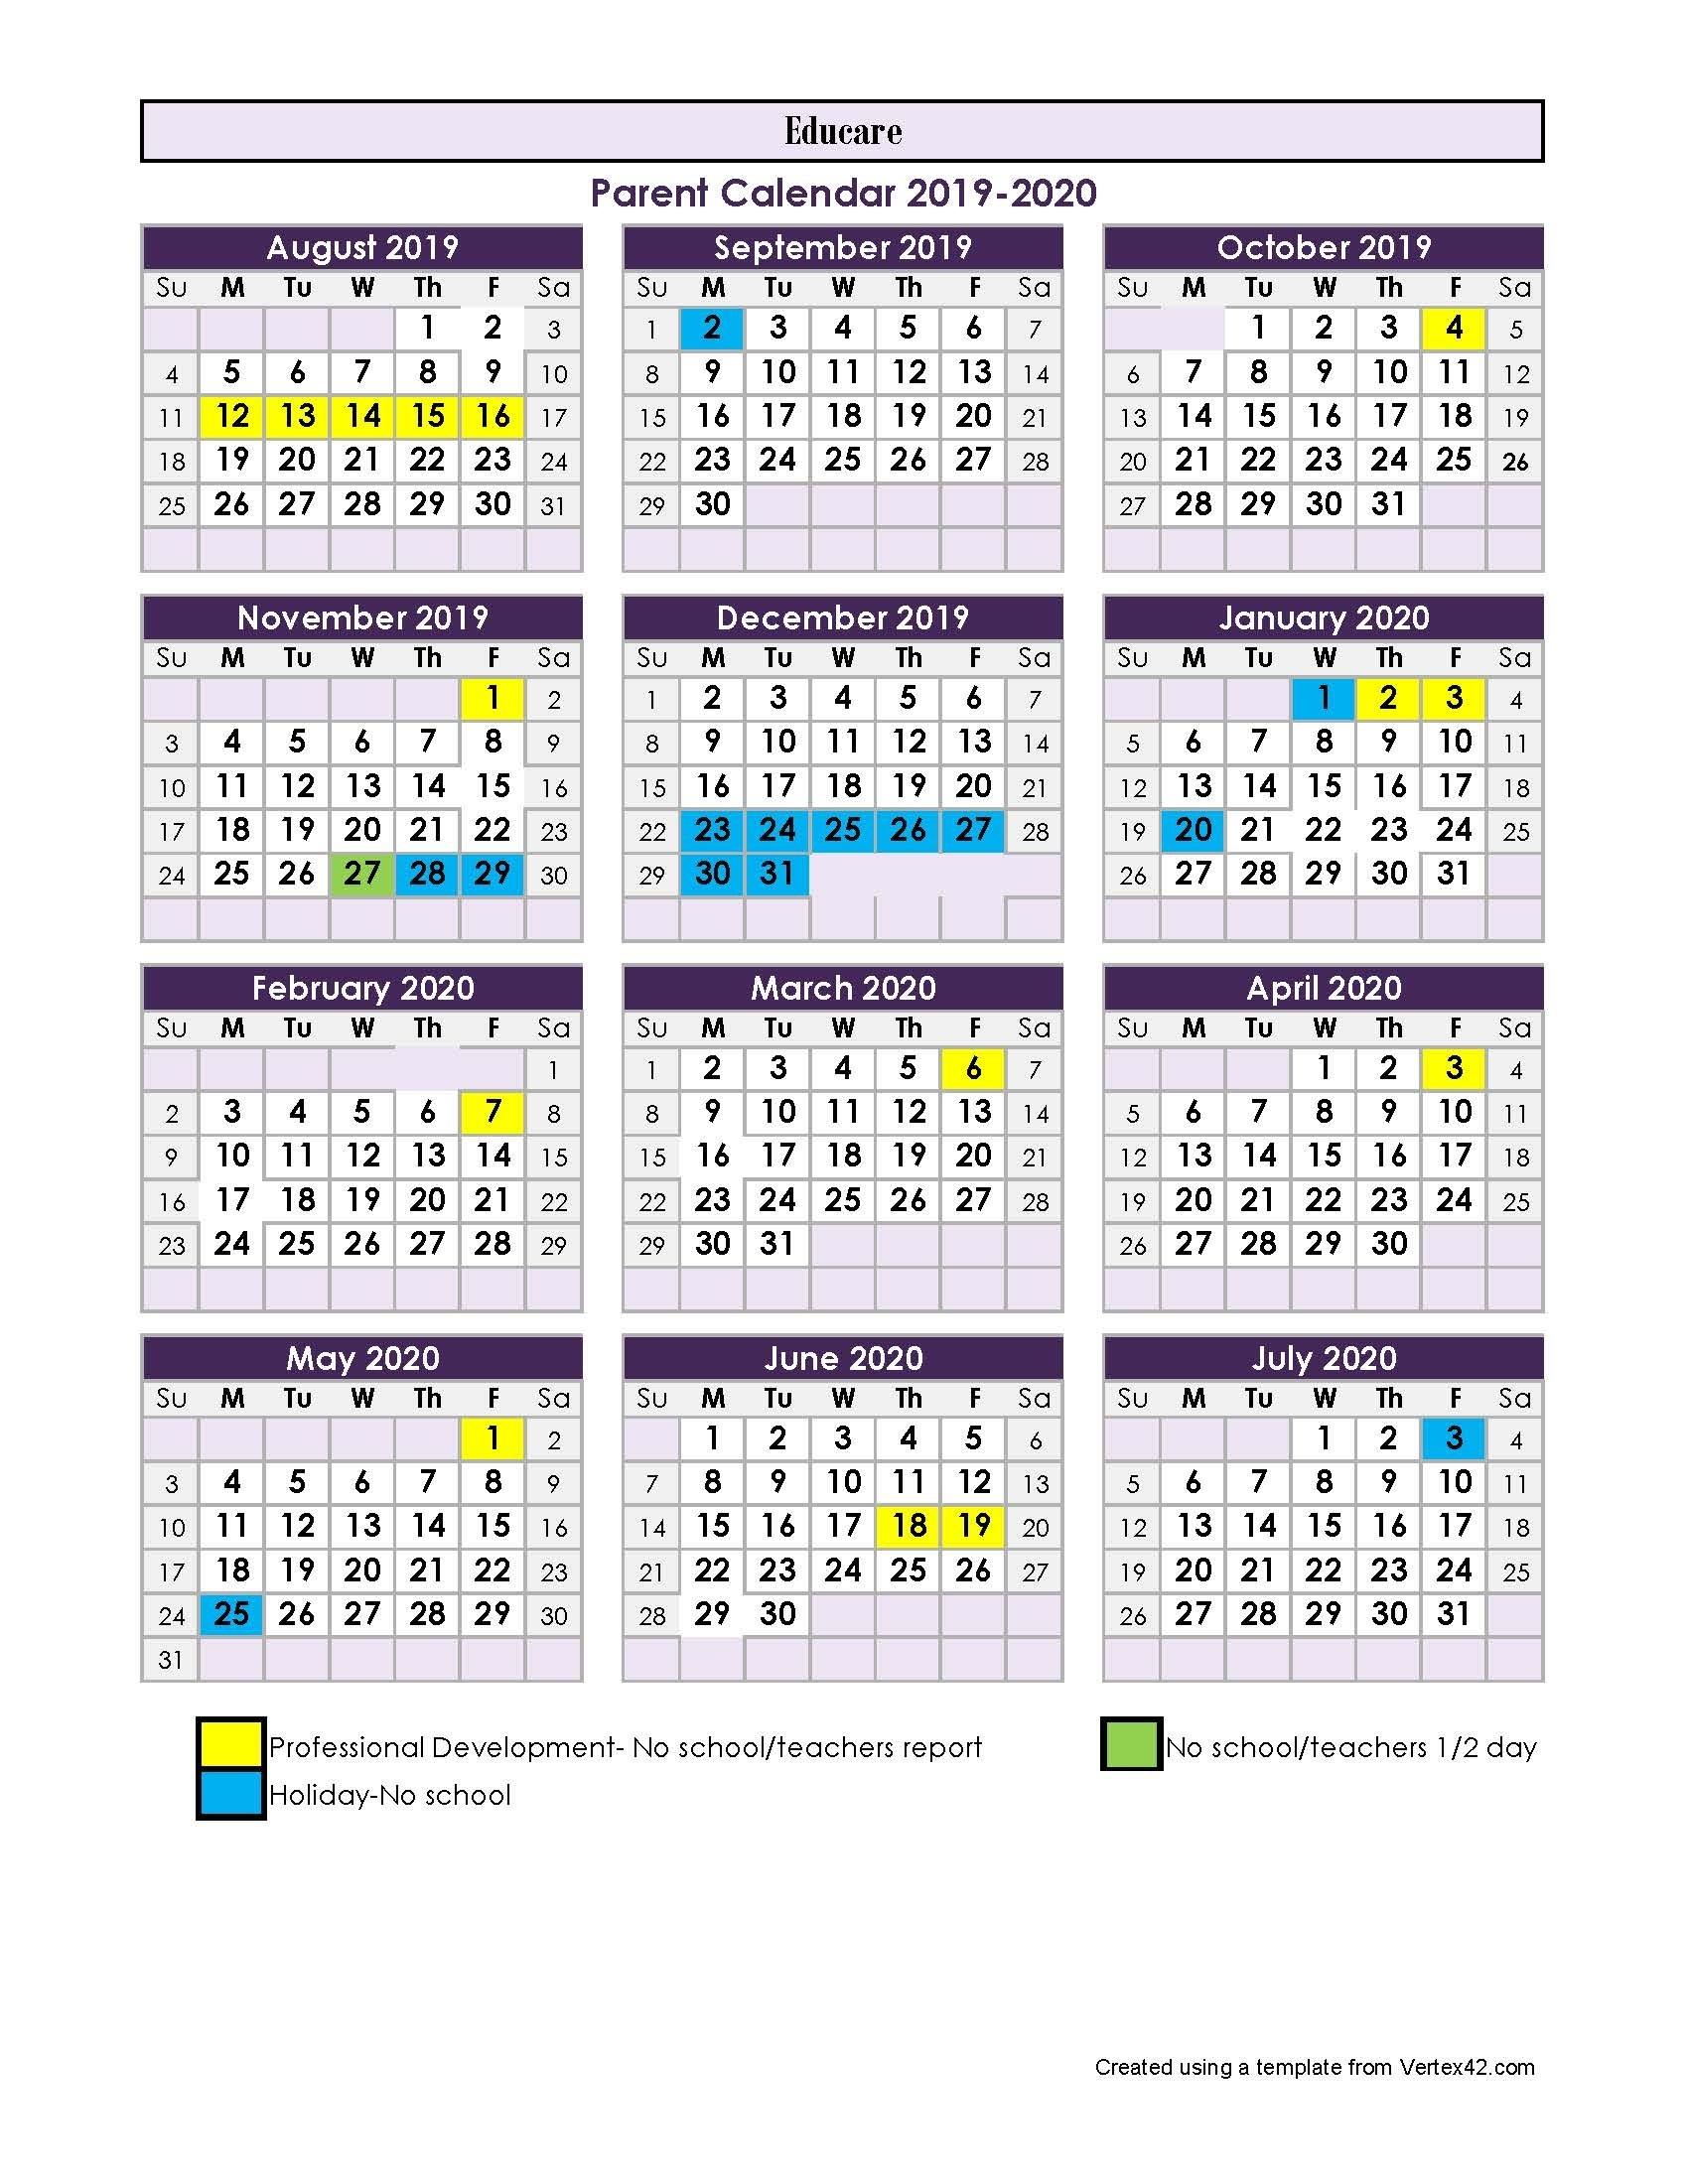 Parent Calendar - 2017-2018-January 2020 School Calendar